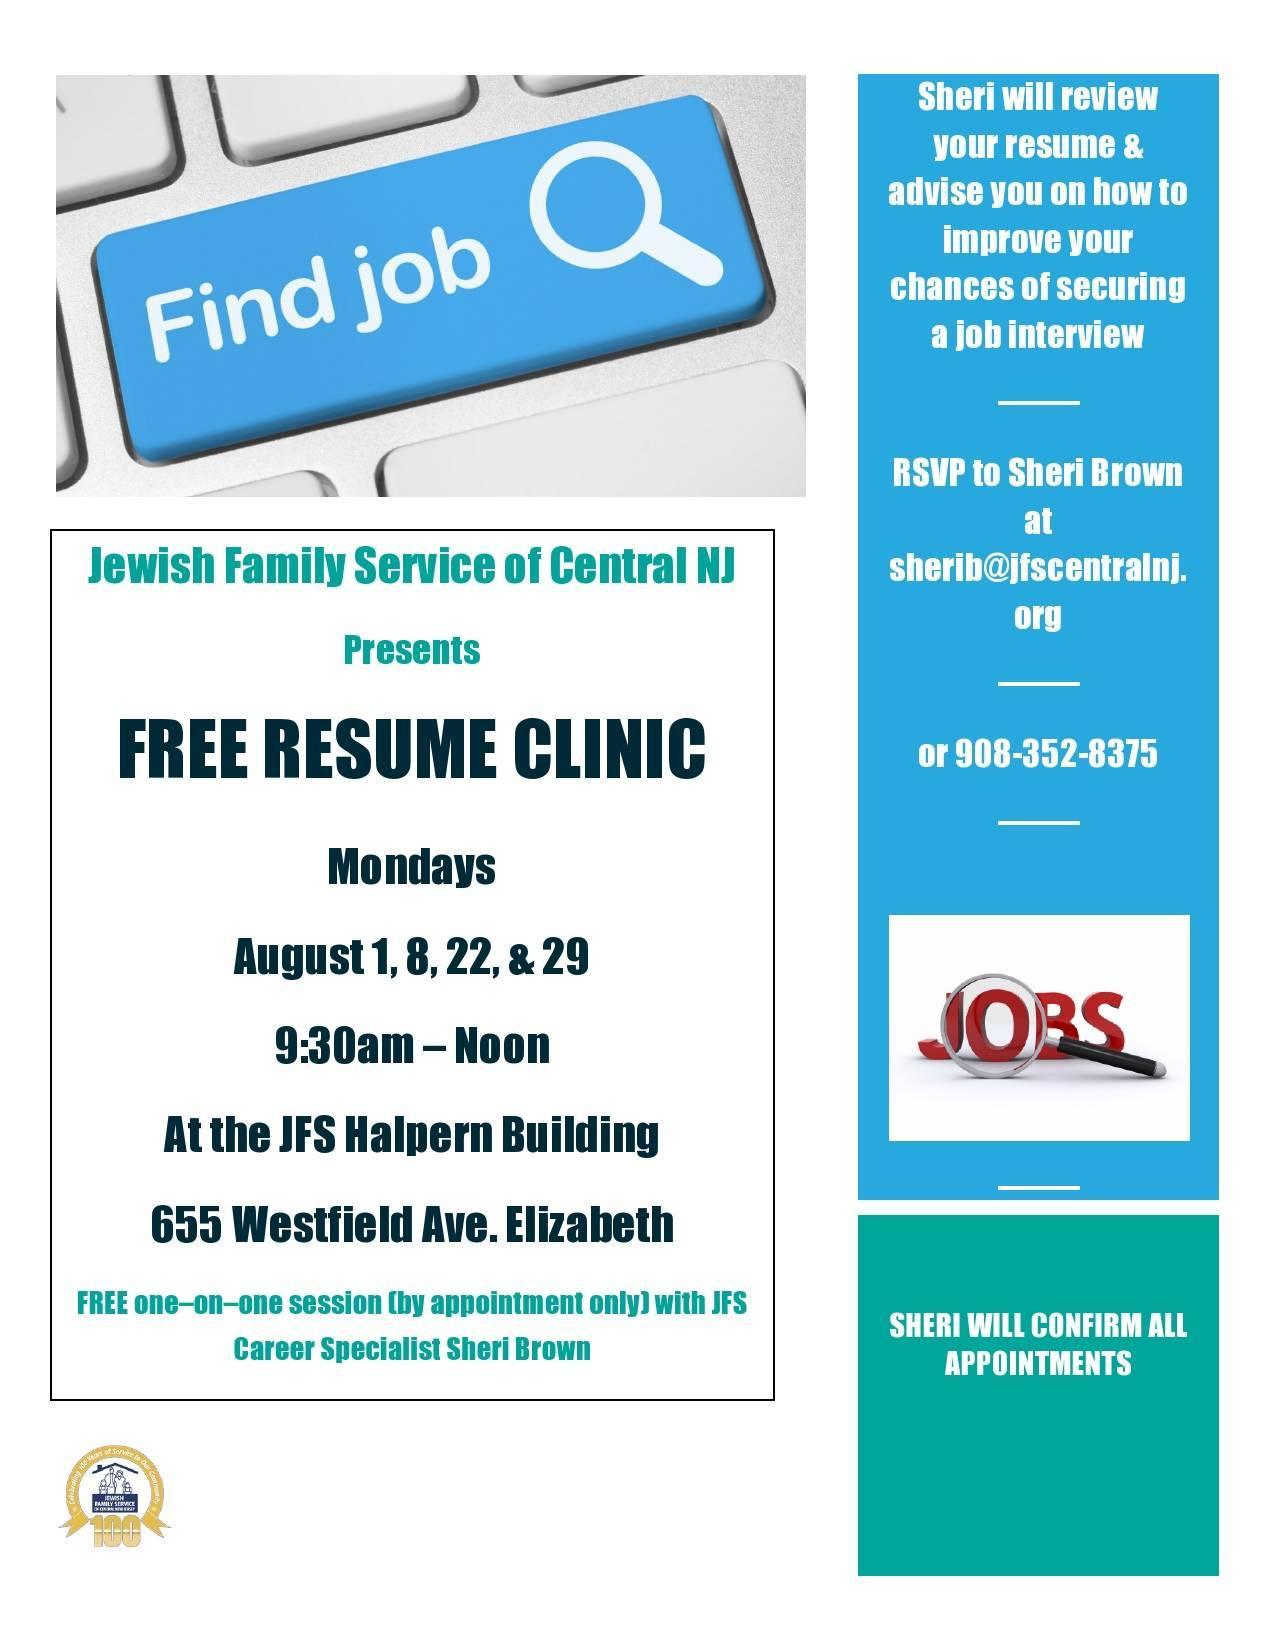 free oneonone resume clinic news tapinto